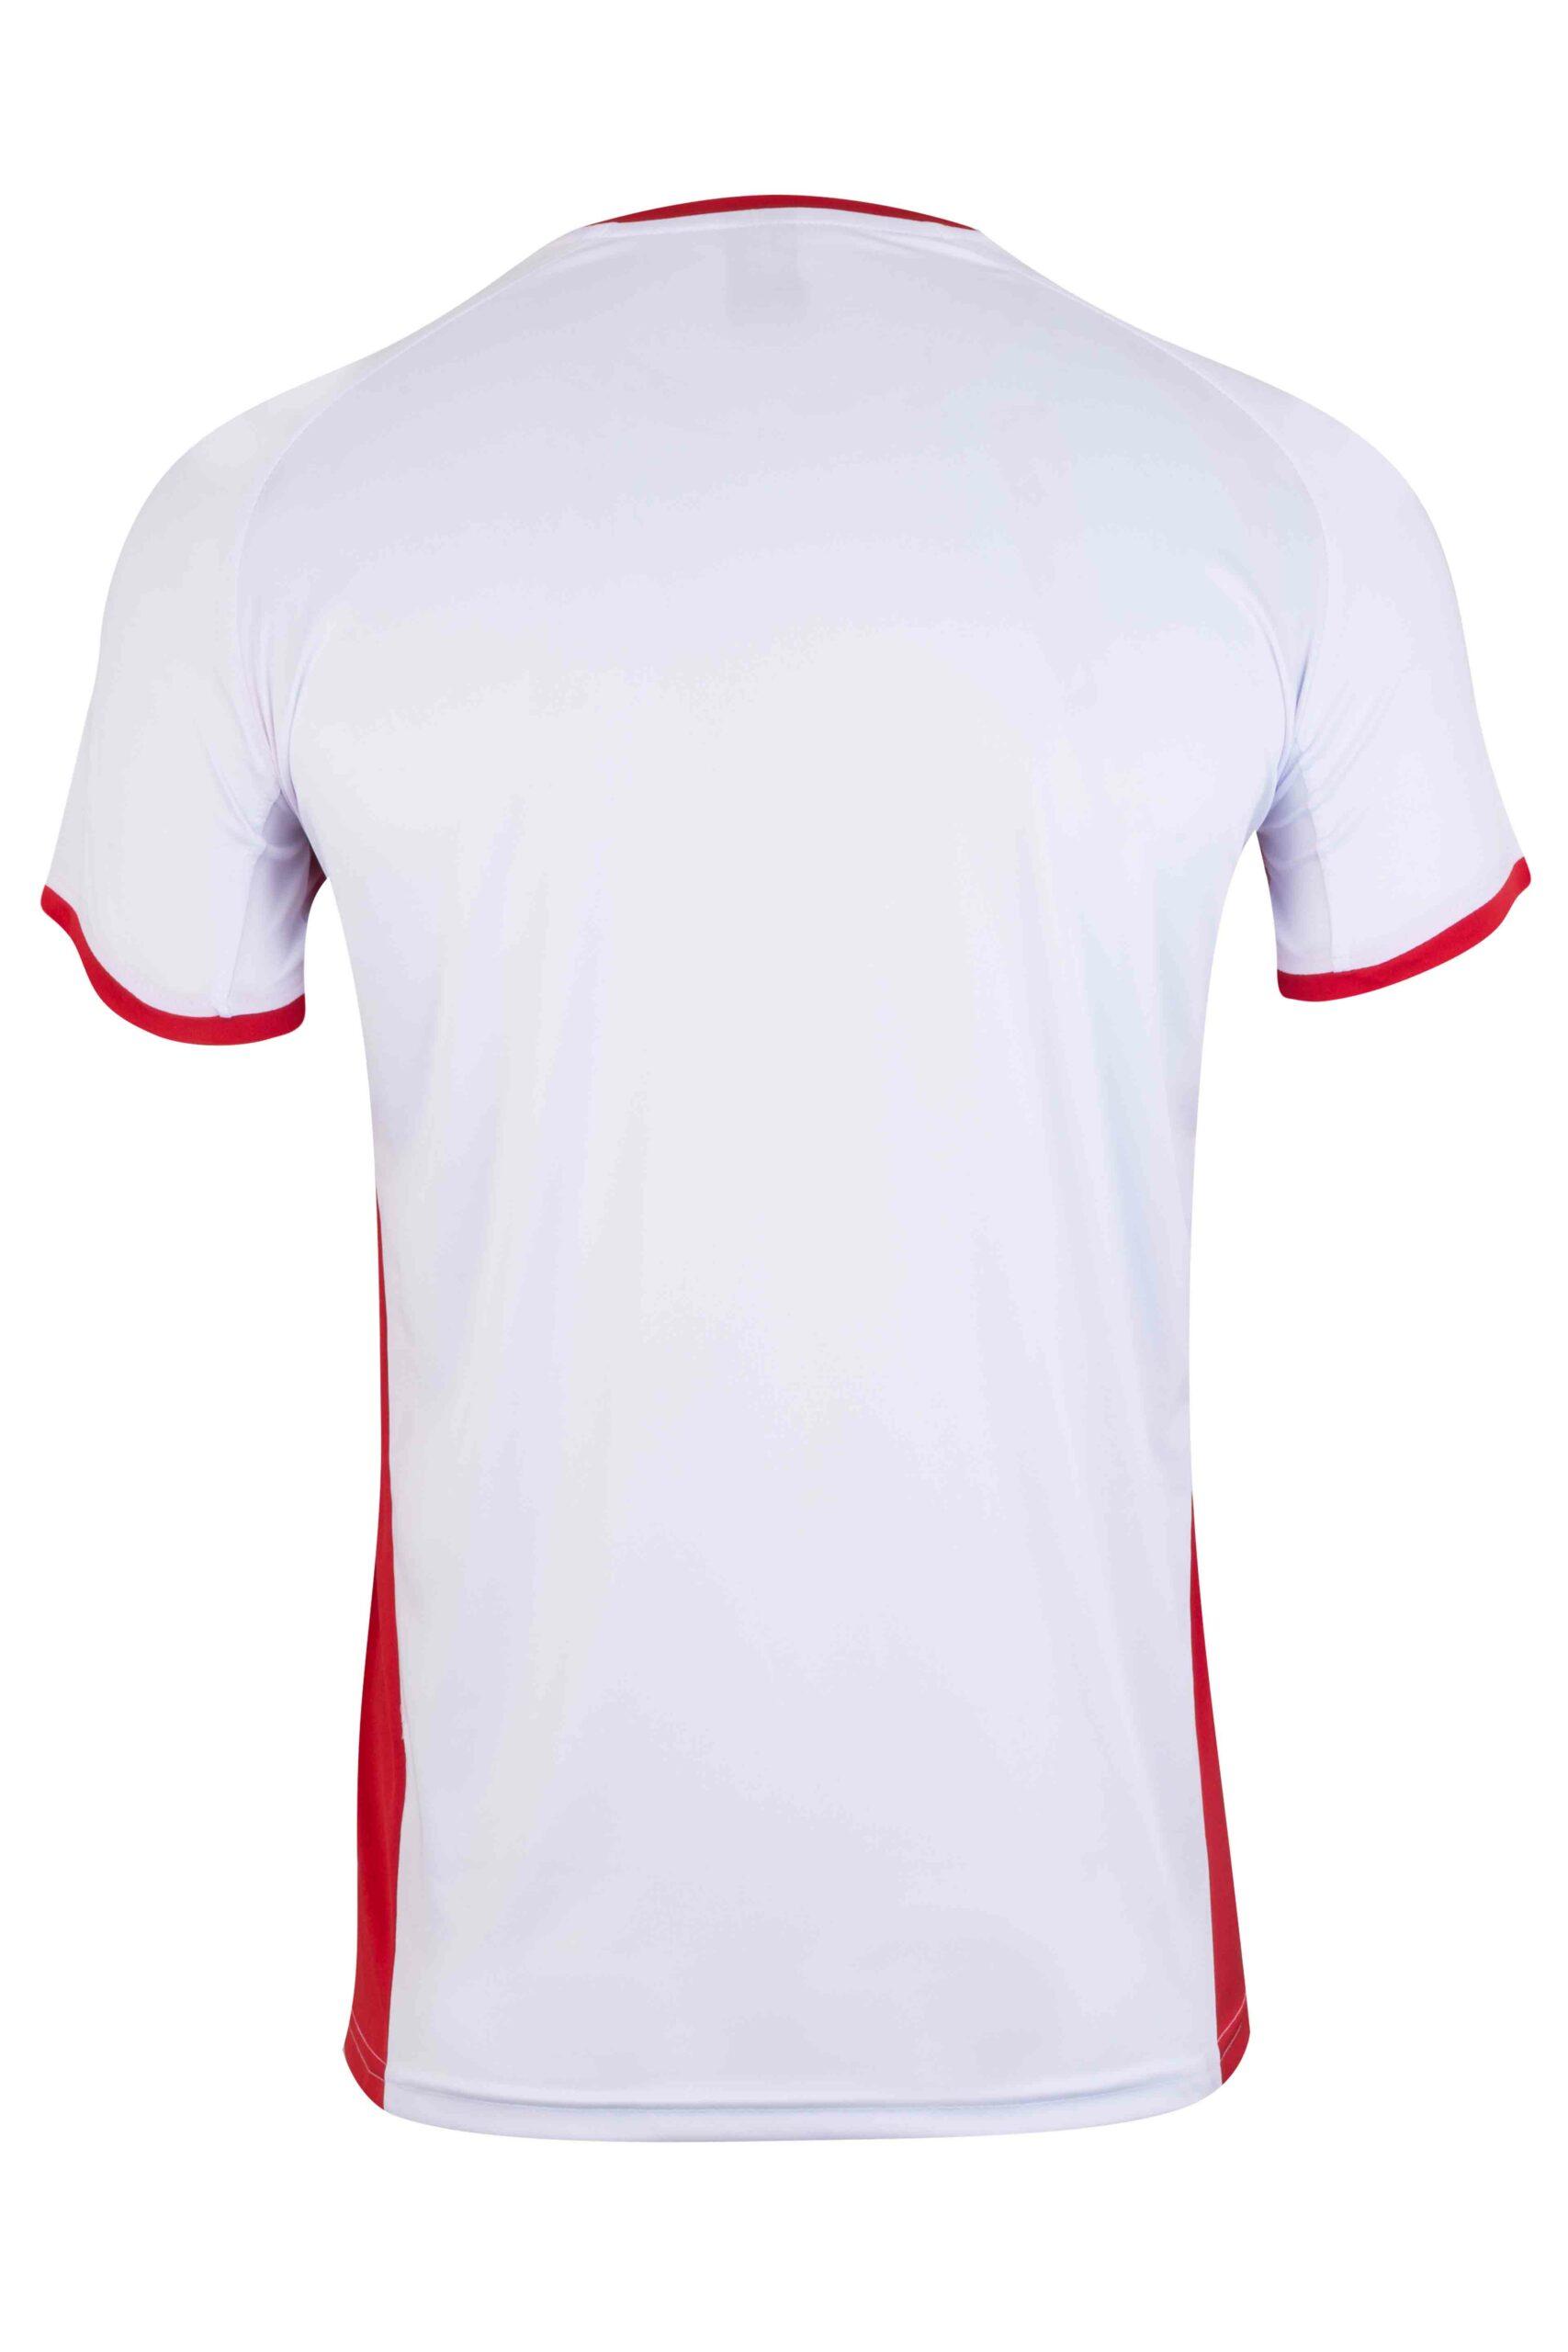 Mukua Mk530v Mukua Camiseta TÉcnica Manga Corta Bicolor White Red 2